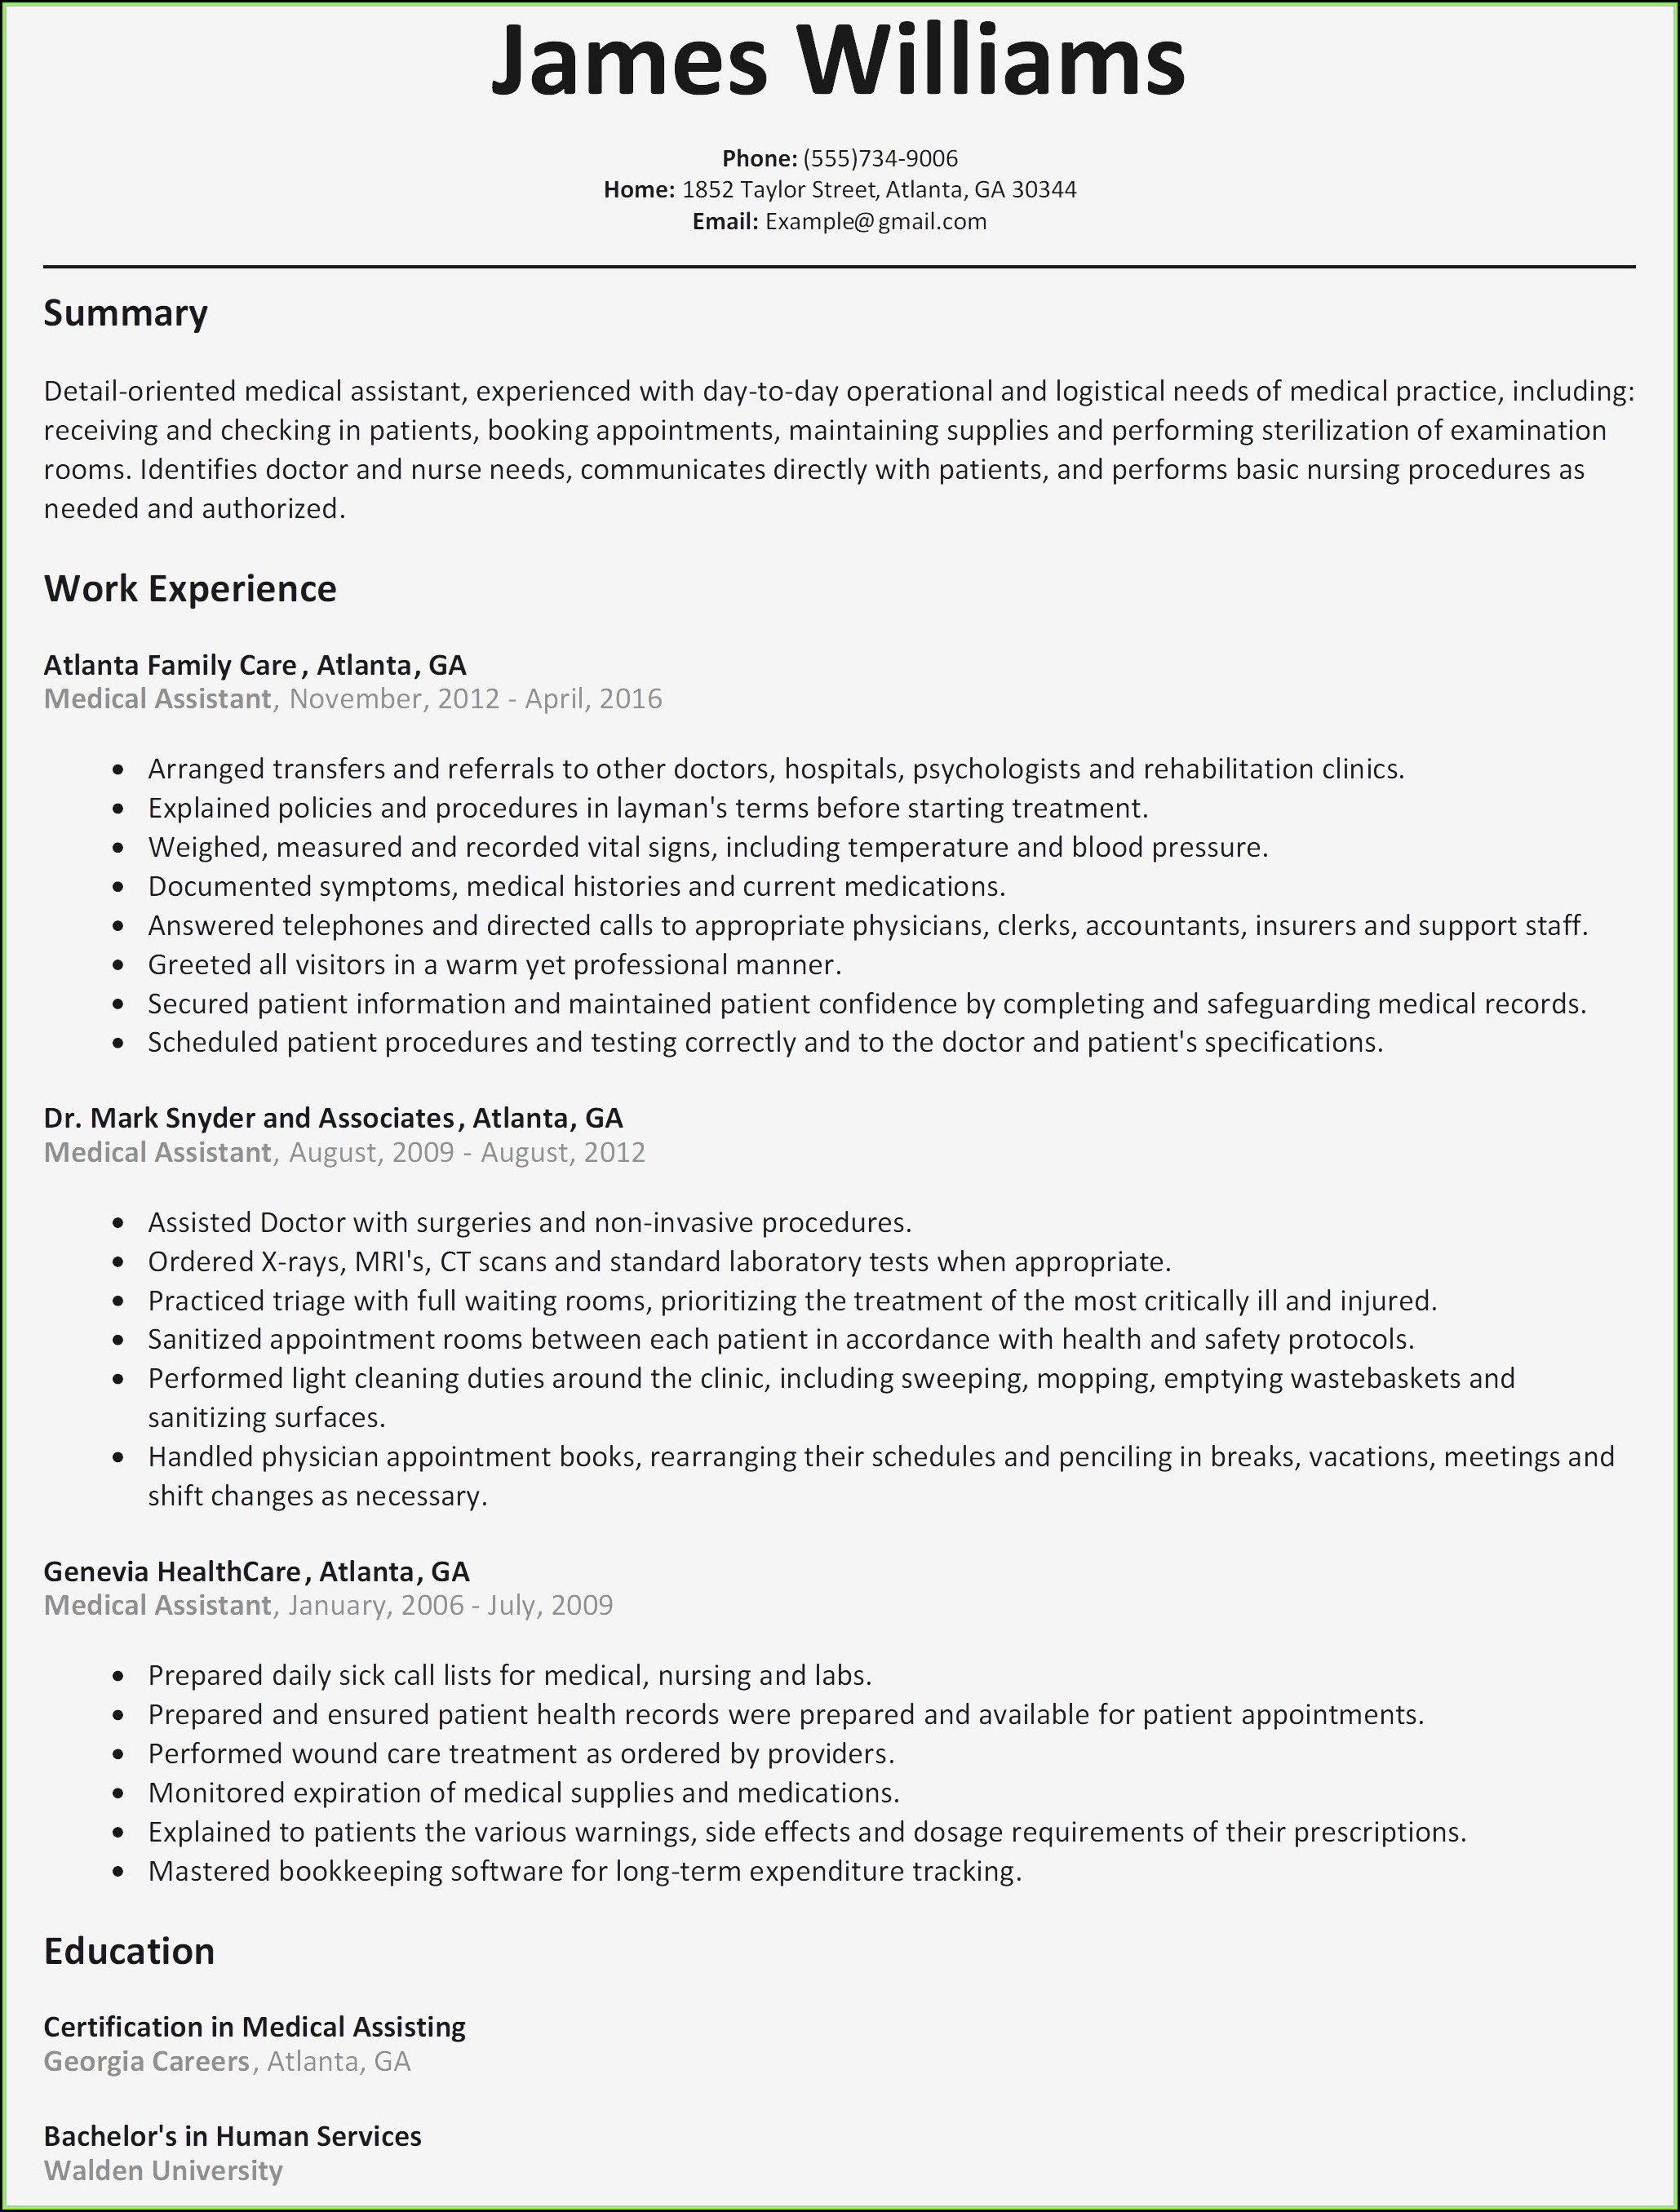 Free Resume Templates Samples Online